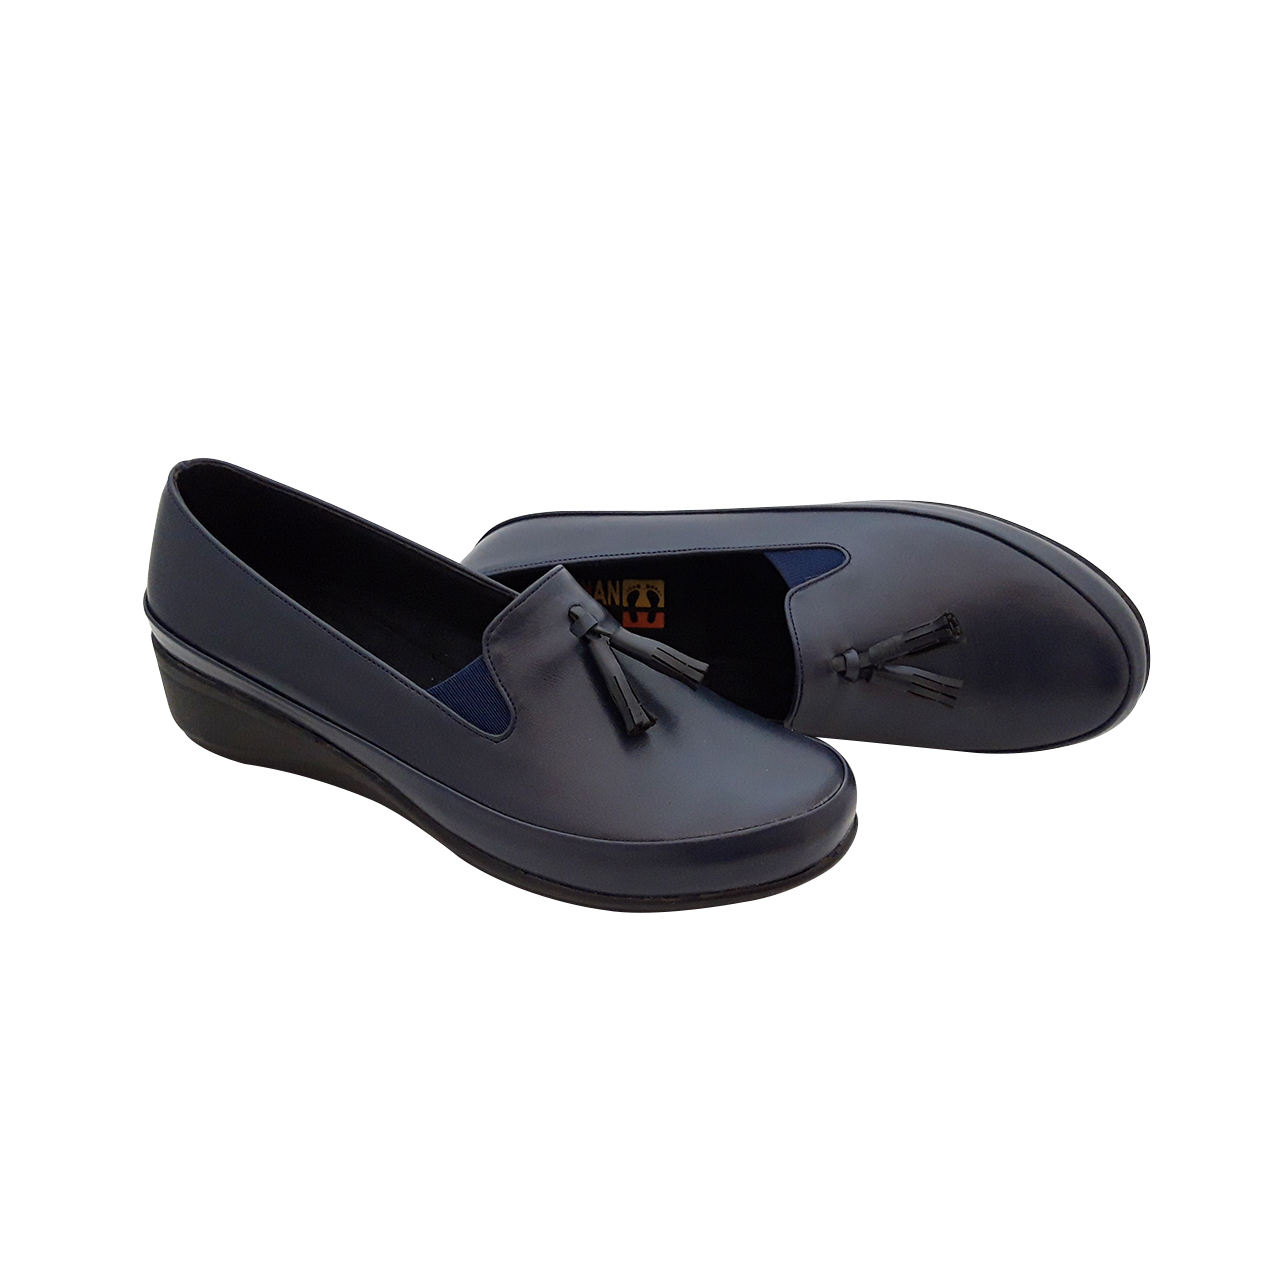 کفش زنانه پاتکان کد 615 کد 01 -  - 1